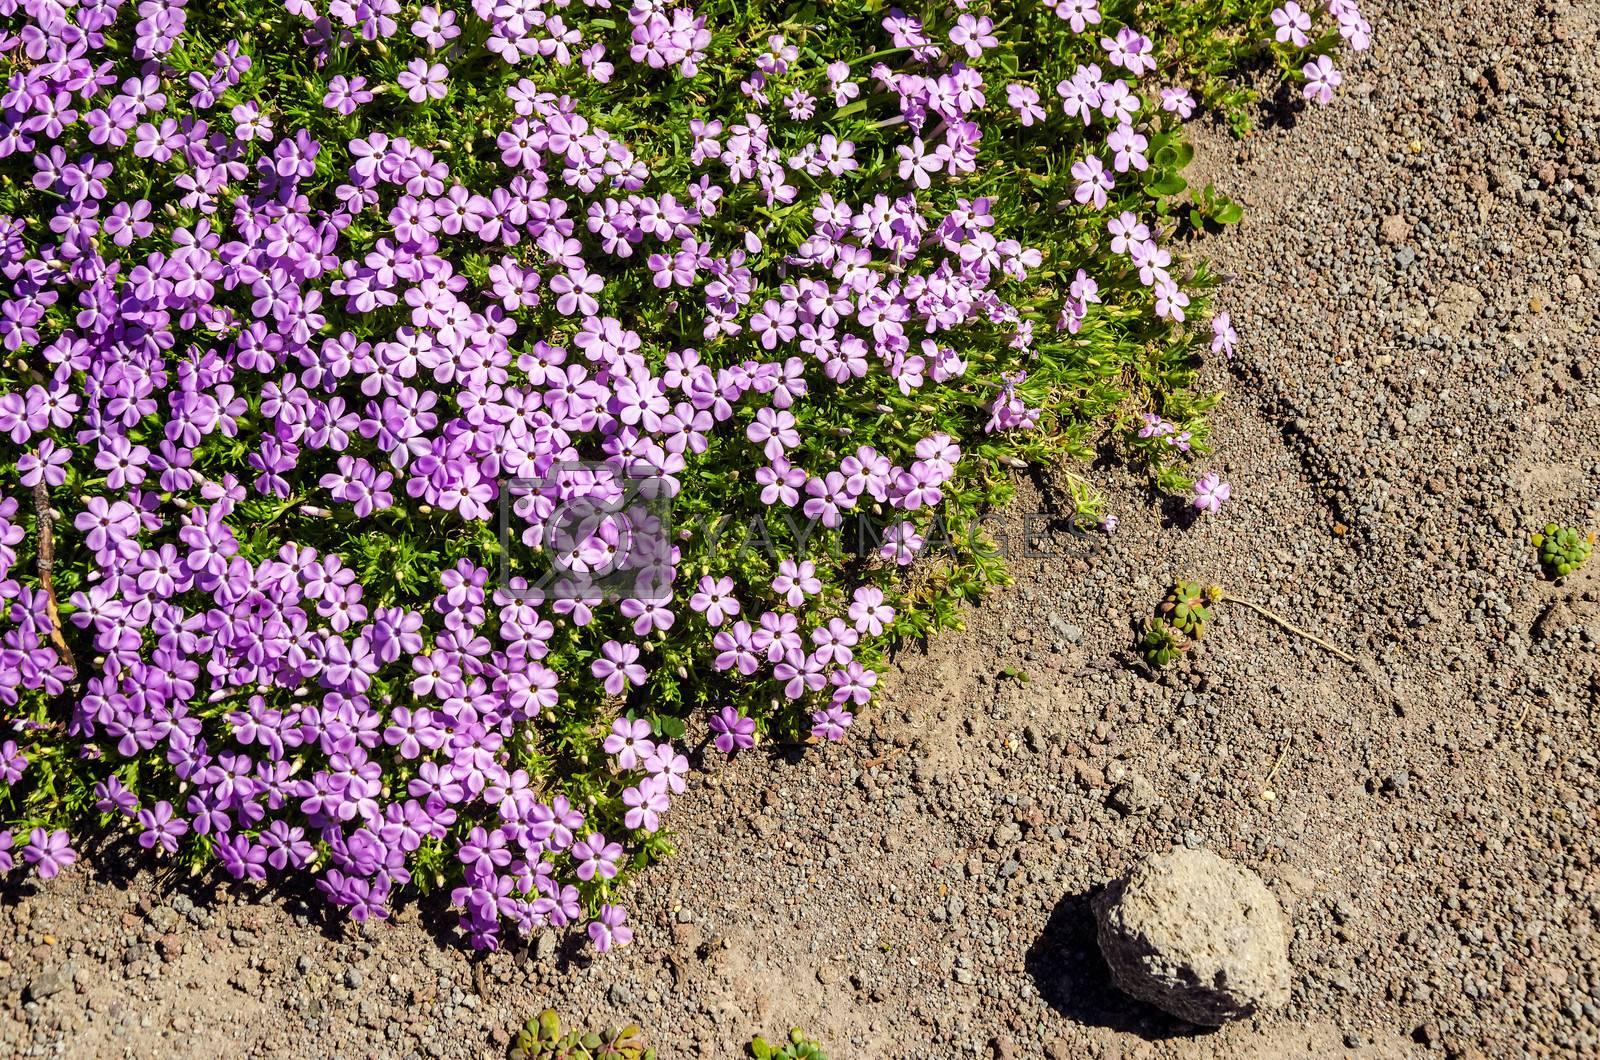 Purple flowers growing in a harsh mountain setting